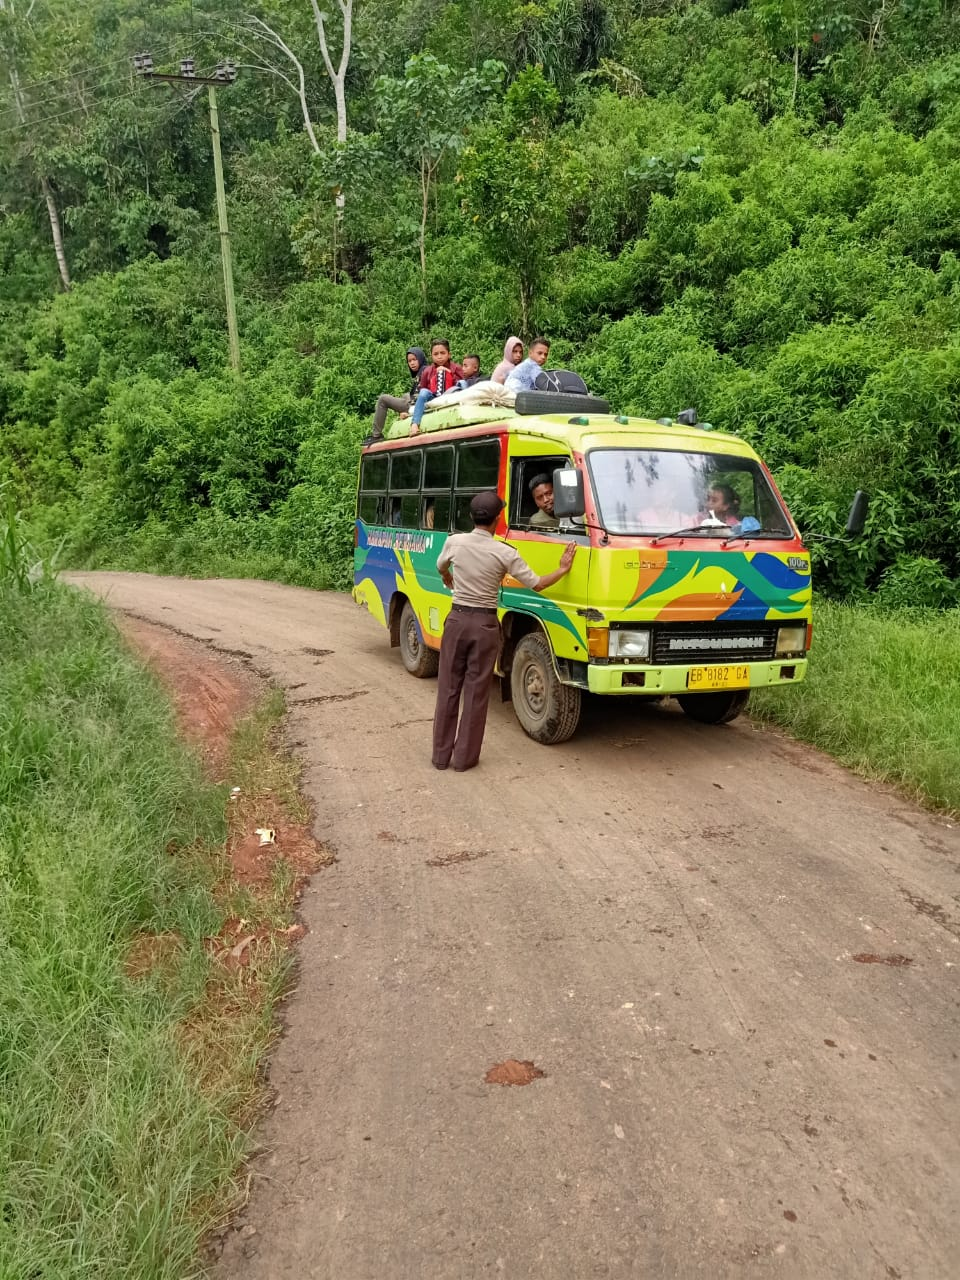 Dukung Keselamatan Berlalu lintas, Polsek Kuwus Tegur Sopir Bus